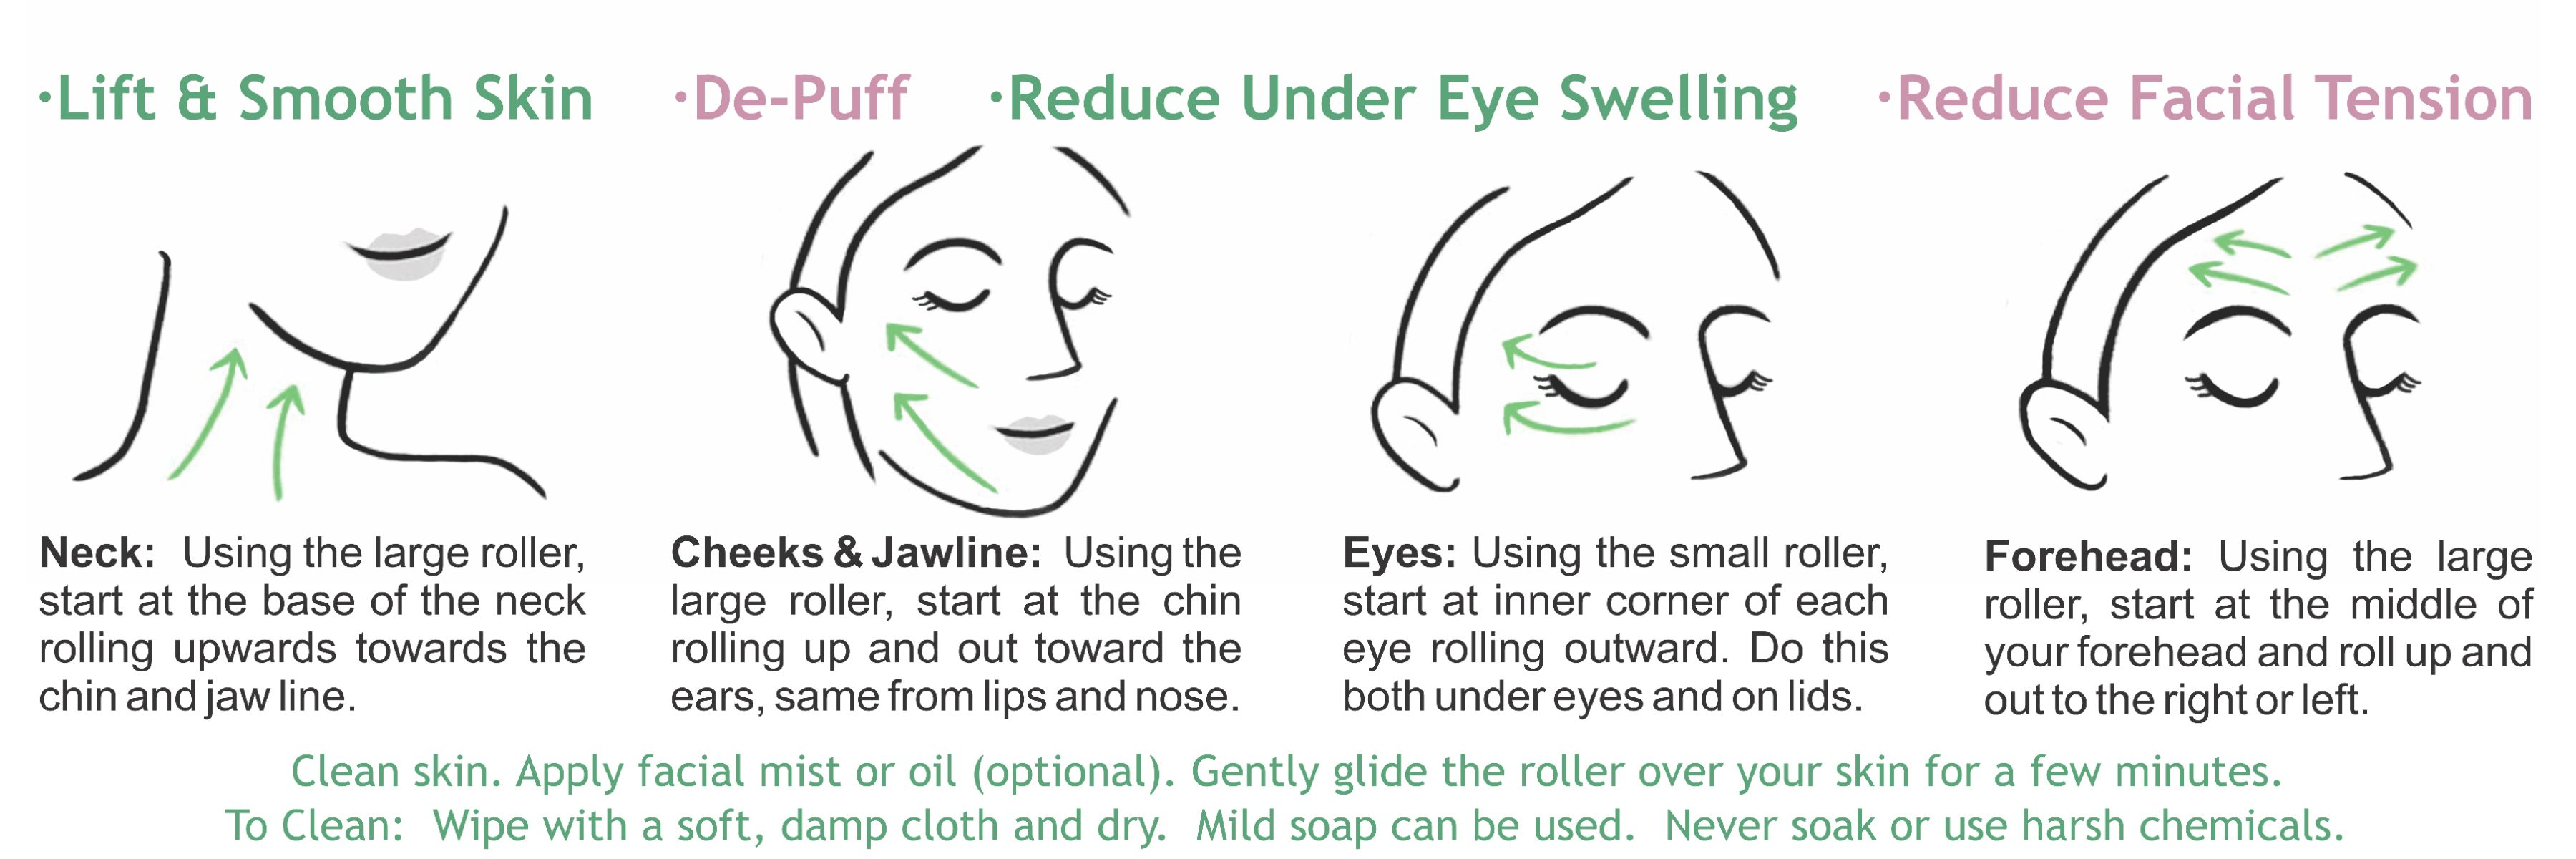 roller-instructions.jpg